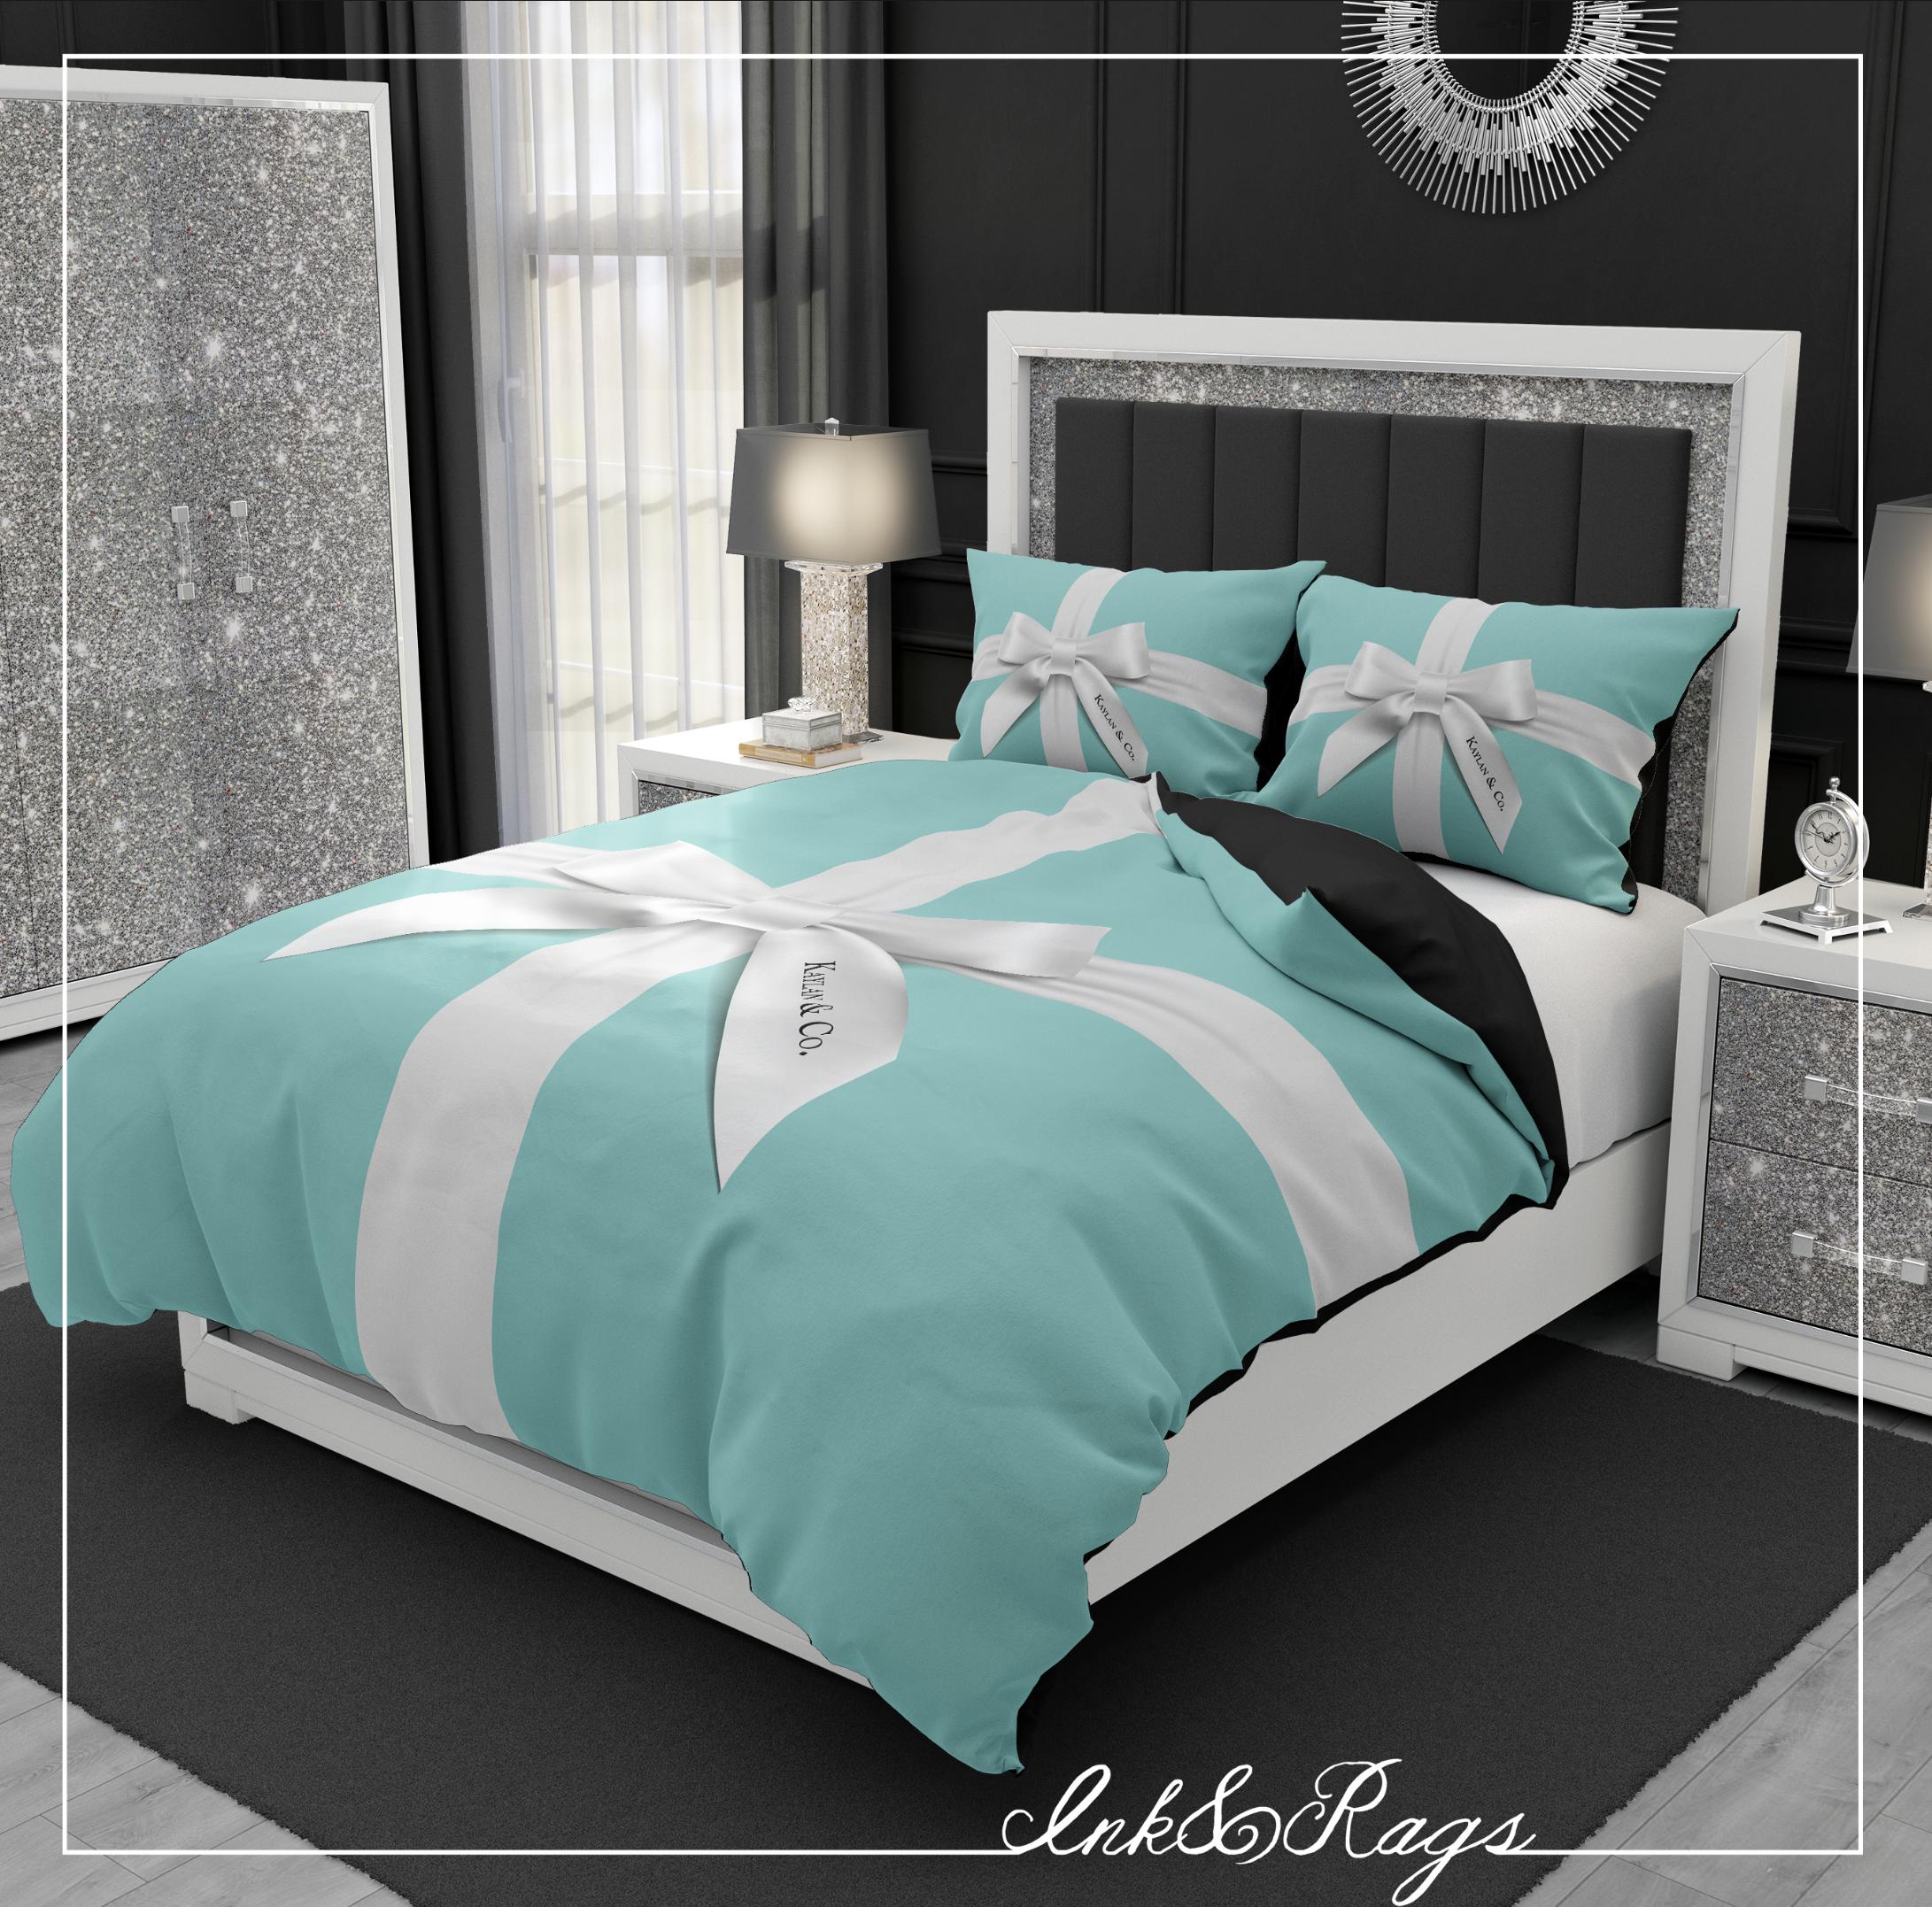 Name & Co Personalized Fashion Bedding | Tiffany Theme ...